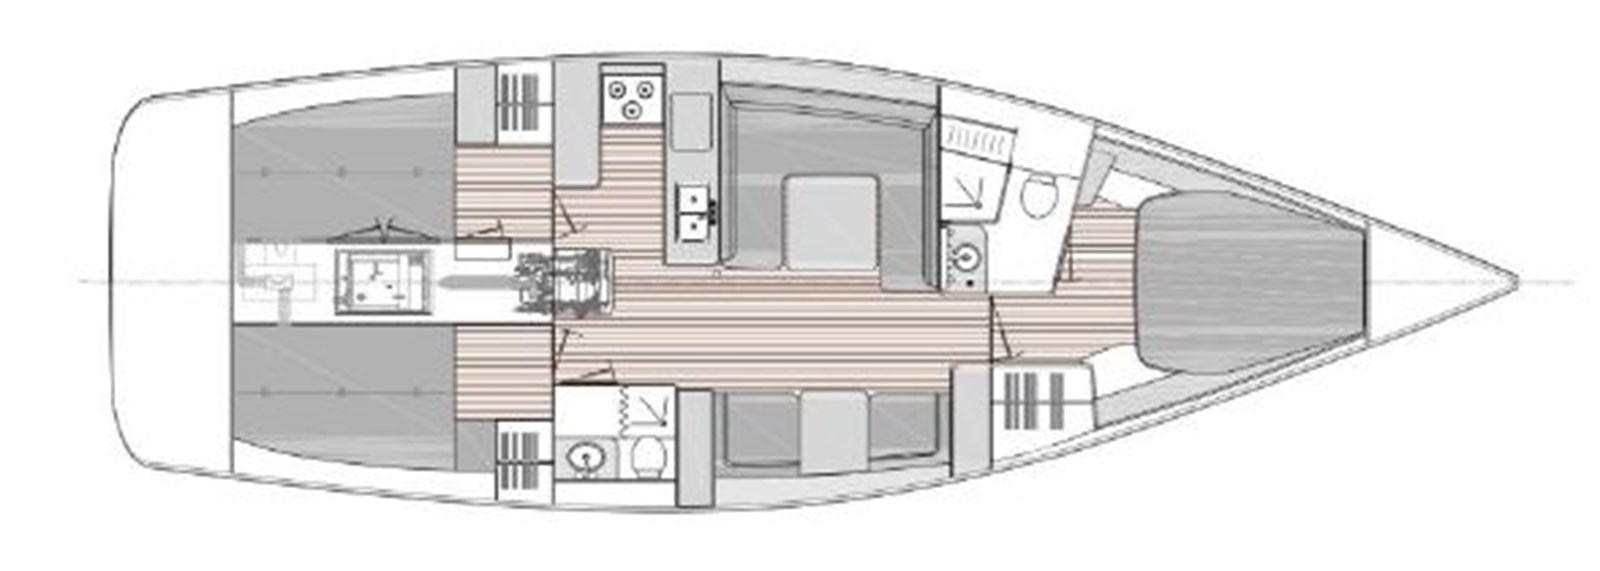 Interior Plan 2020 CATALINA 425 Sloop 2910642